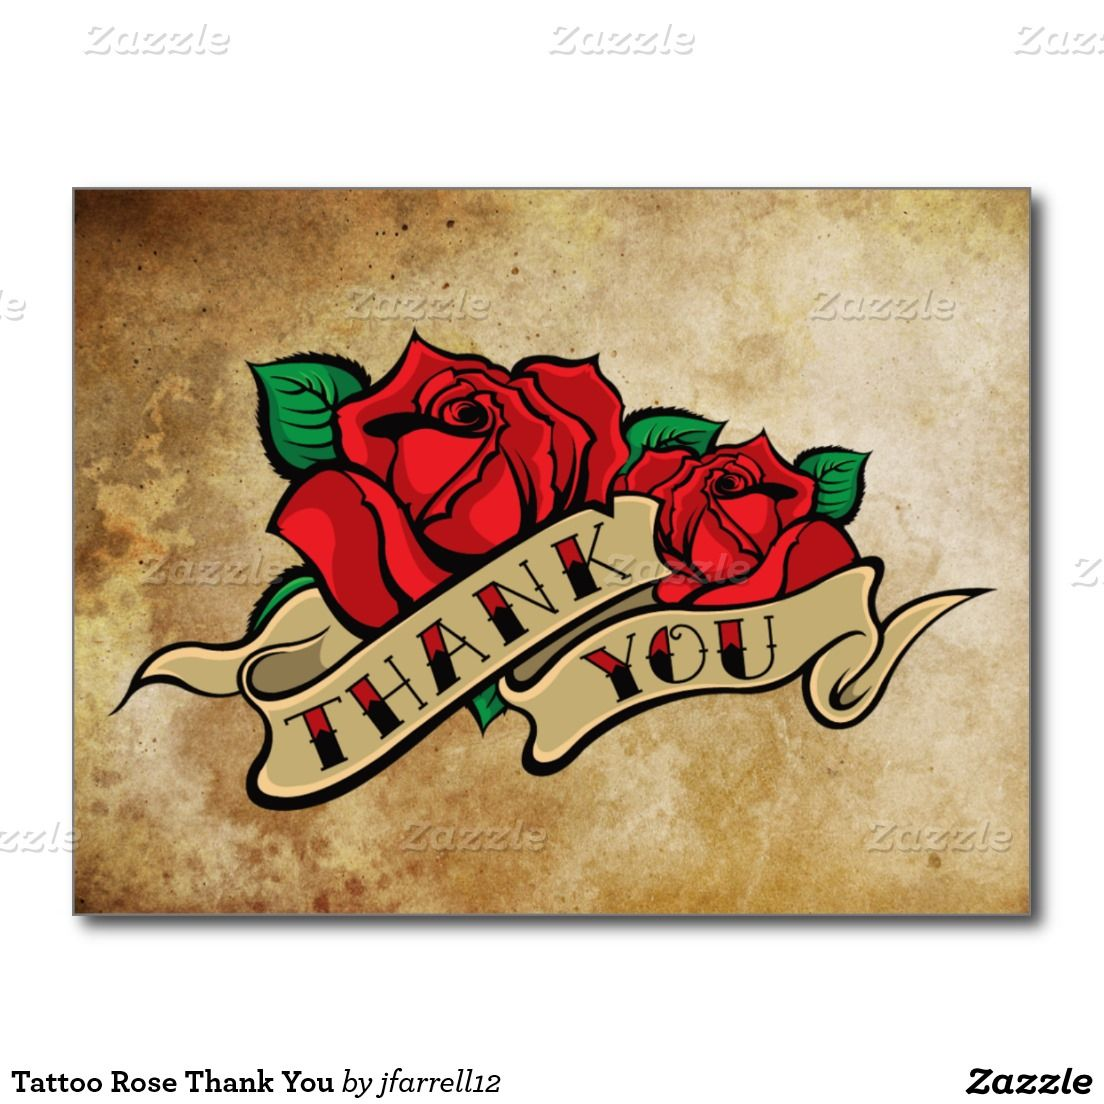 Tattoo Rose Thank You Postcard | Tattoo roses